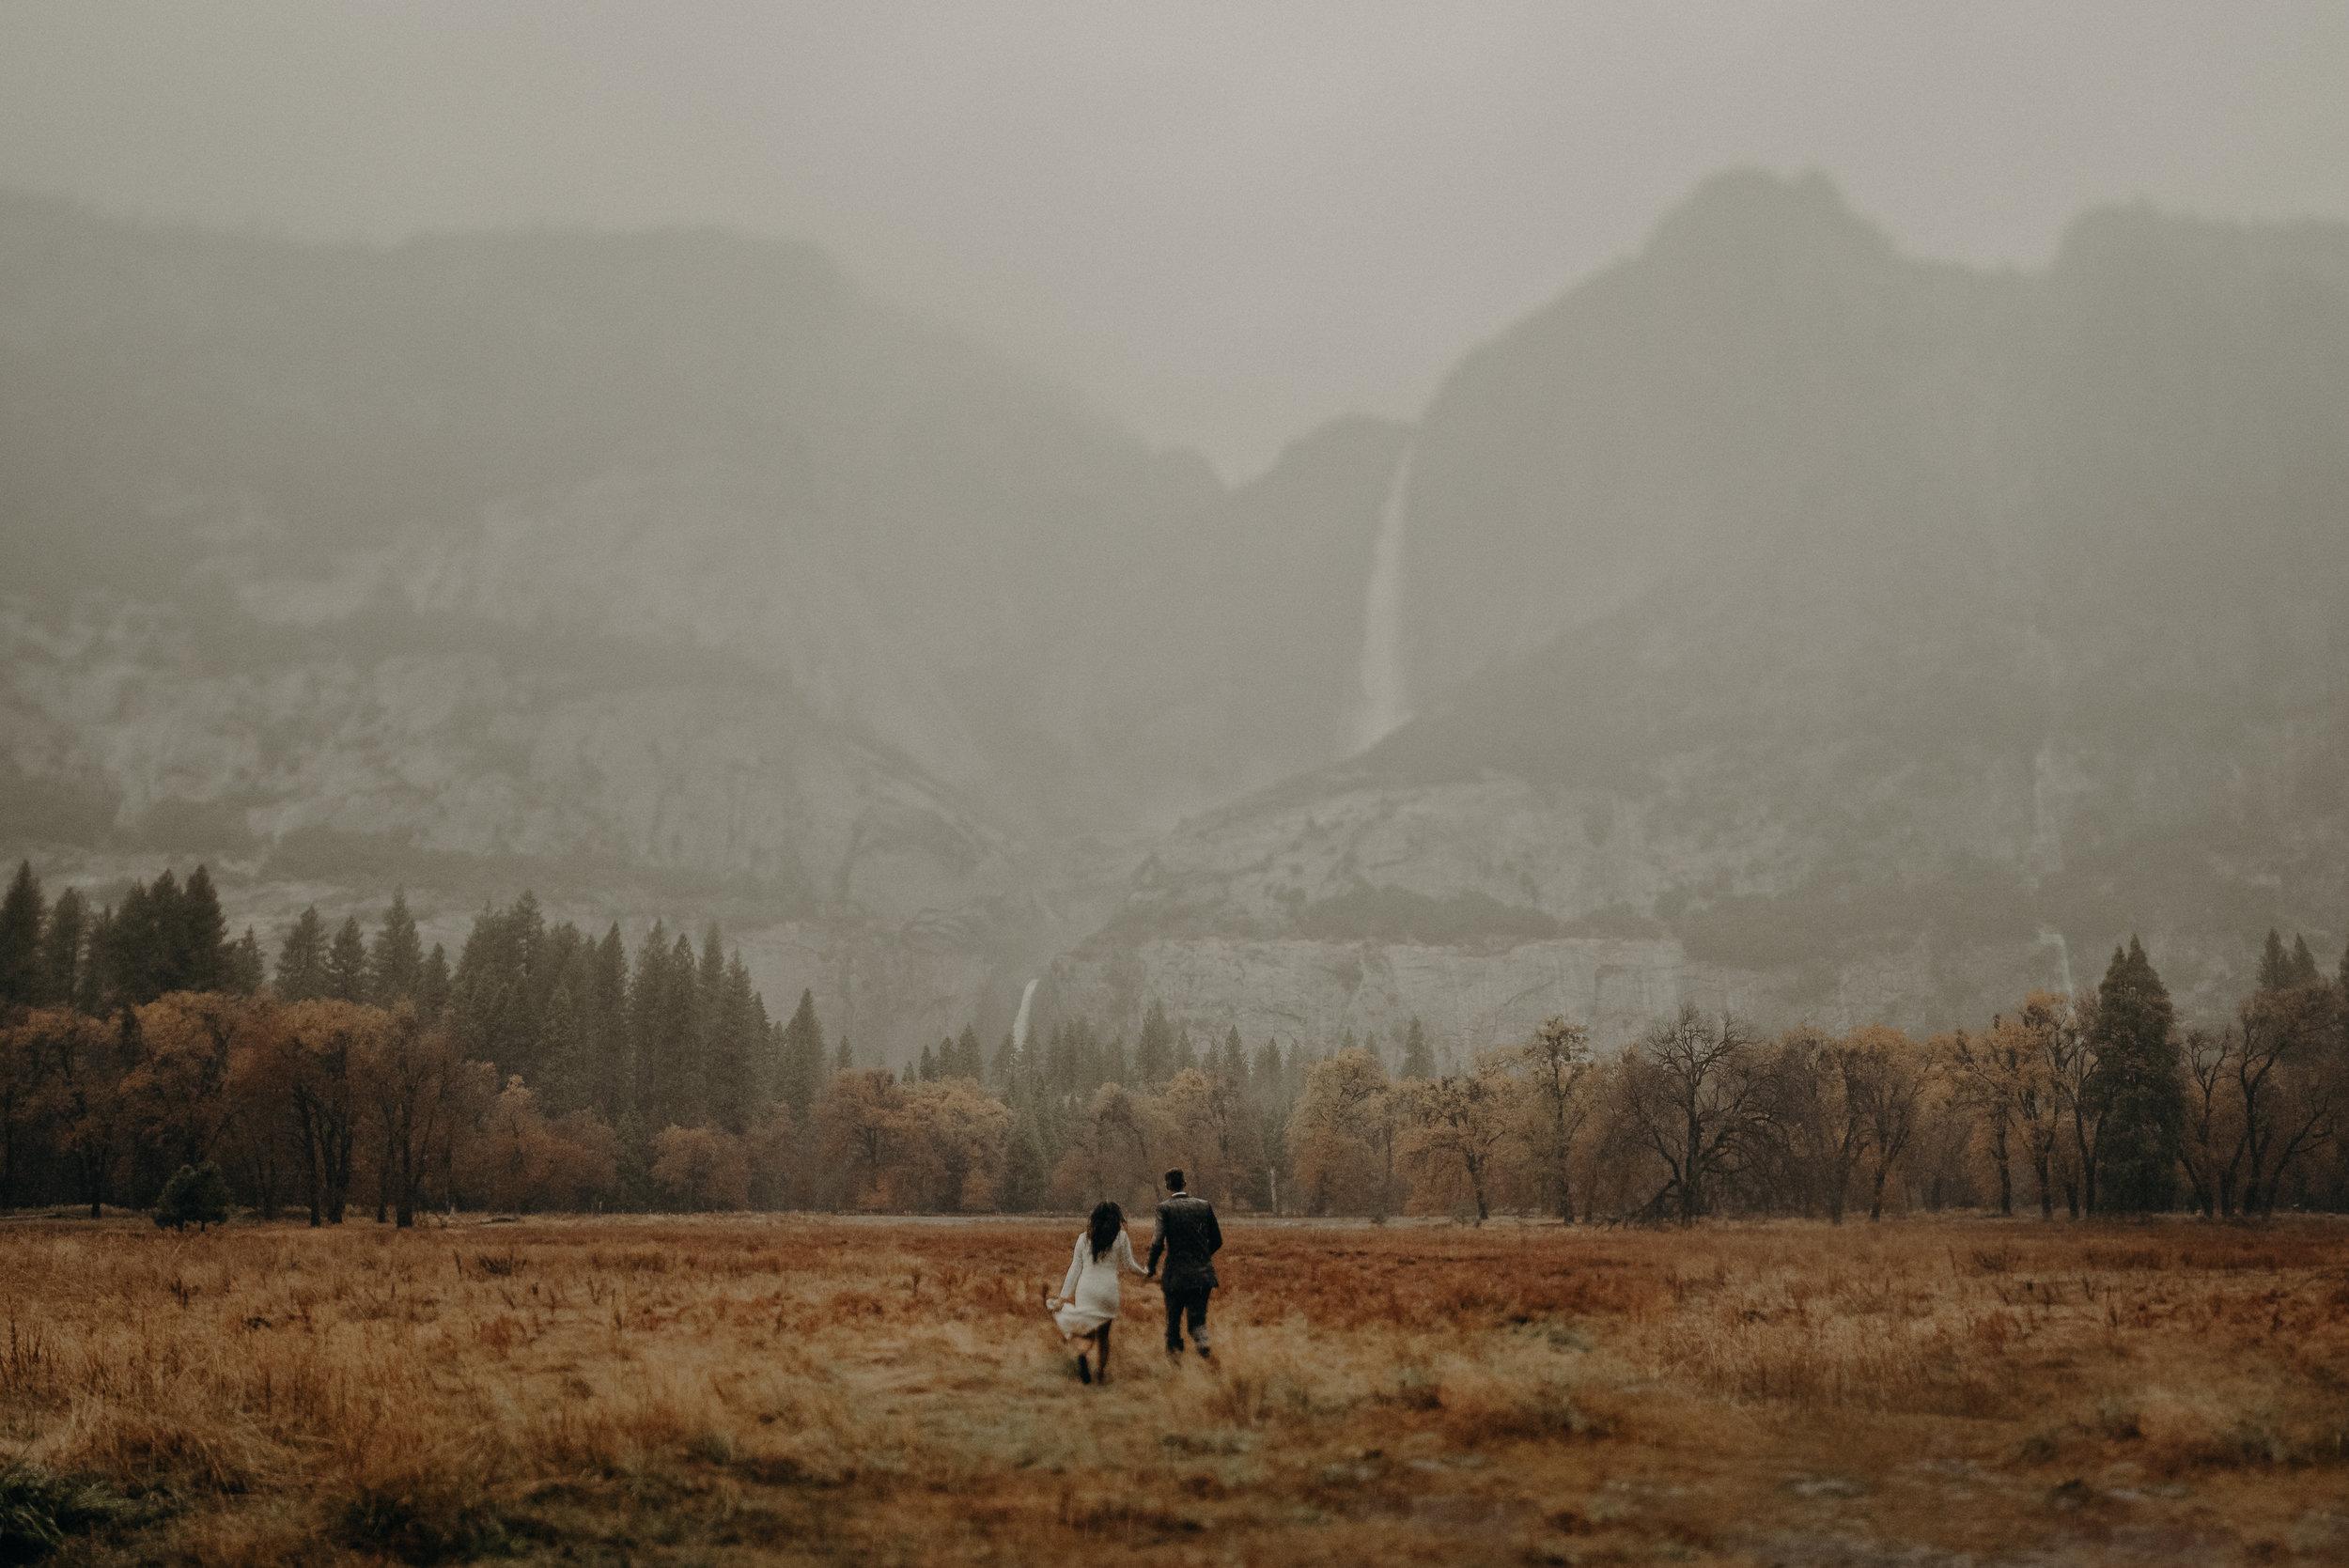 Isaiah + Taylor Photography - Yosemite Elopement - Los Angeles Wedding Photographer-51.jpg